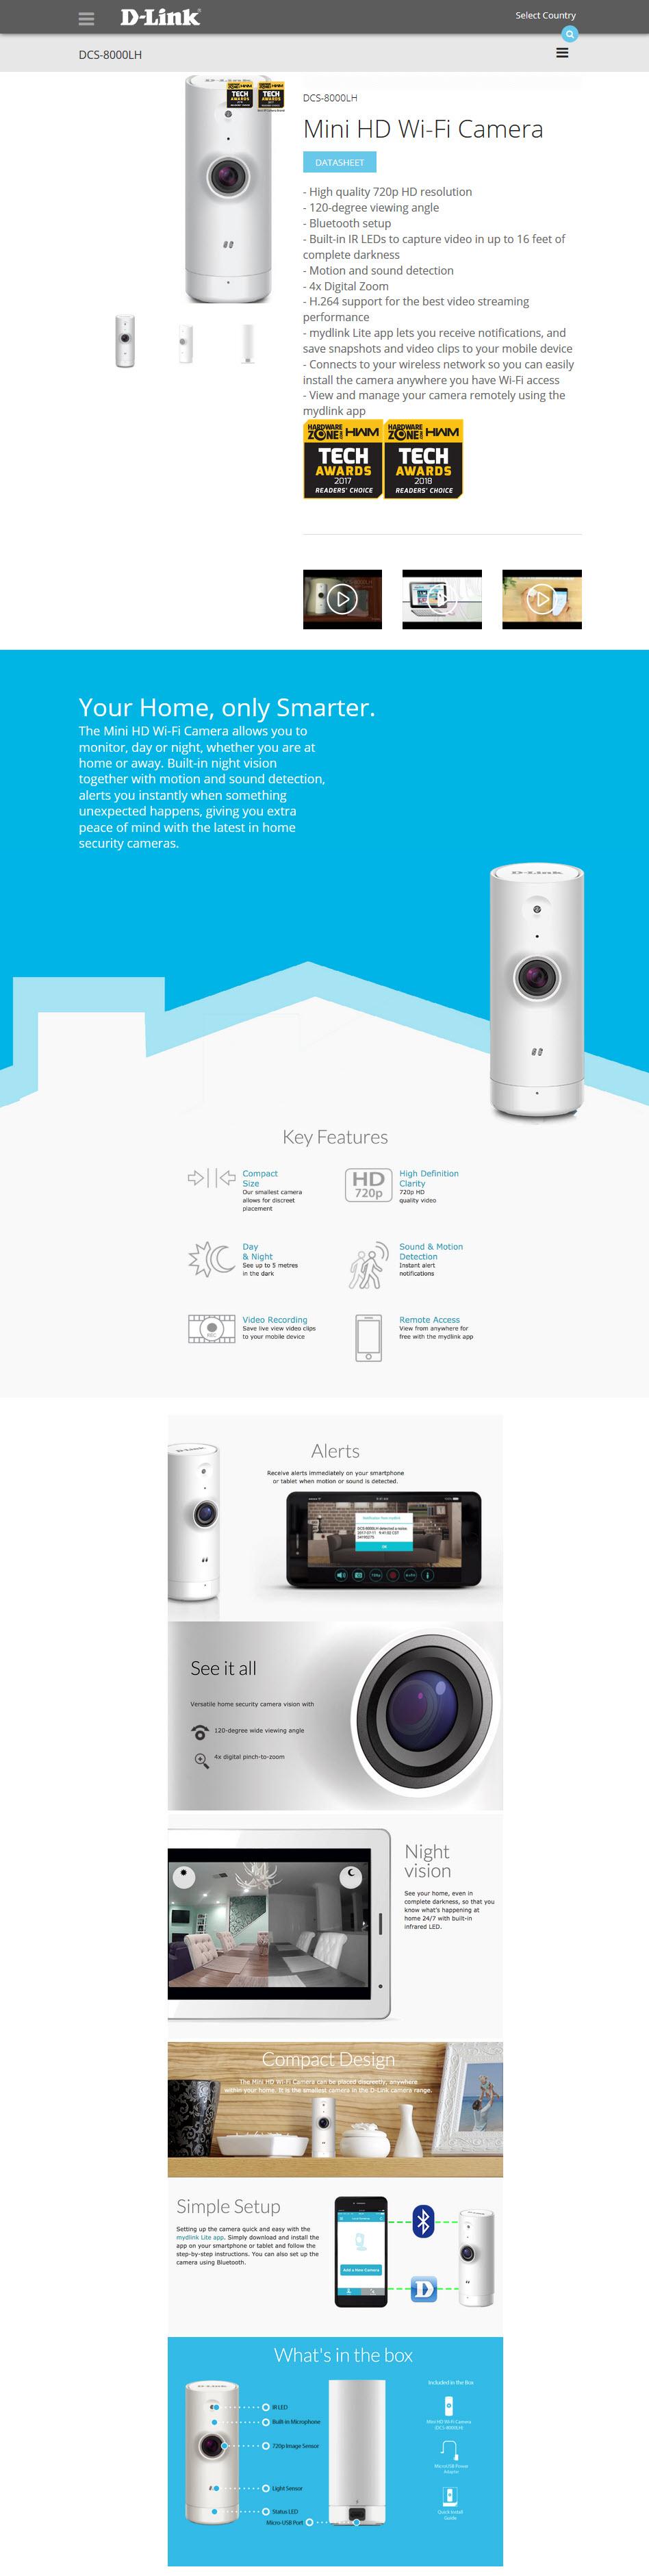 2019 01 21 20 51 41 D Link Mini HD Wi Fi Camera Review